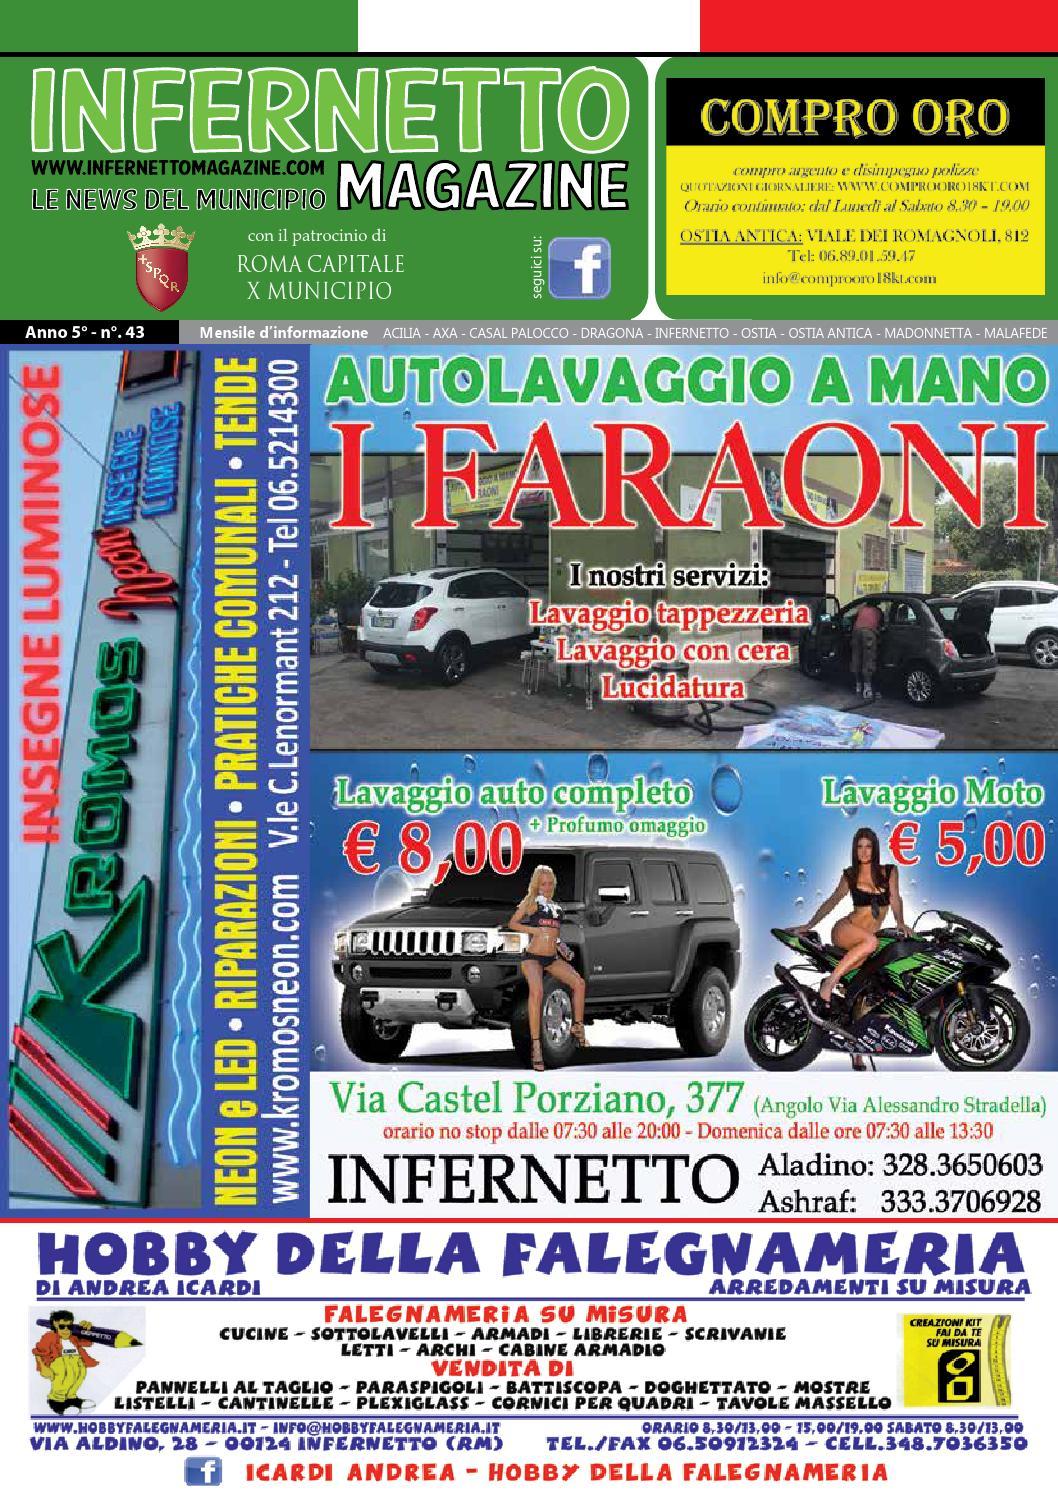 Di Tommaso Arredamenti Ostia infernetto magazine n°43 by esse editore - issuu